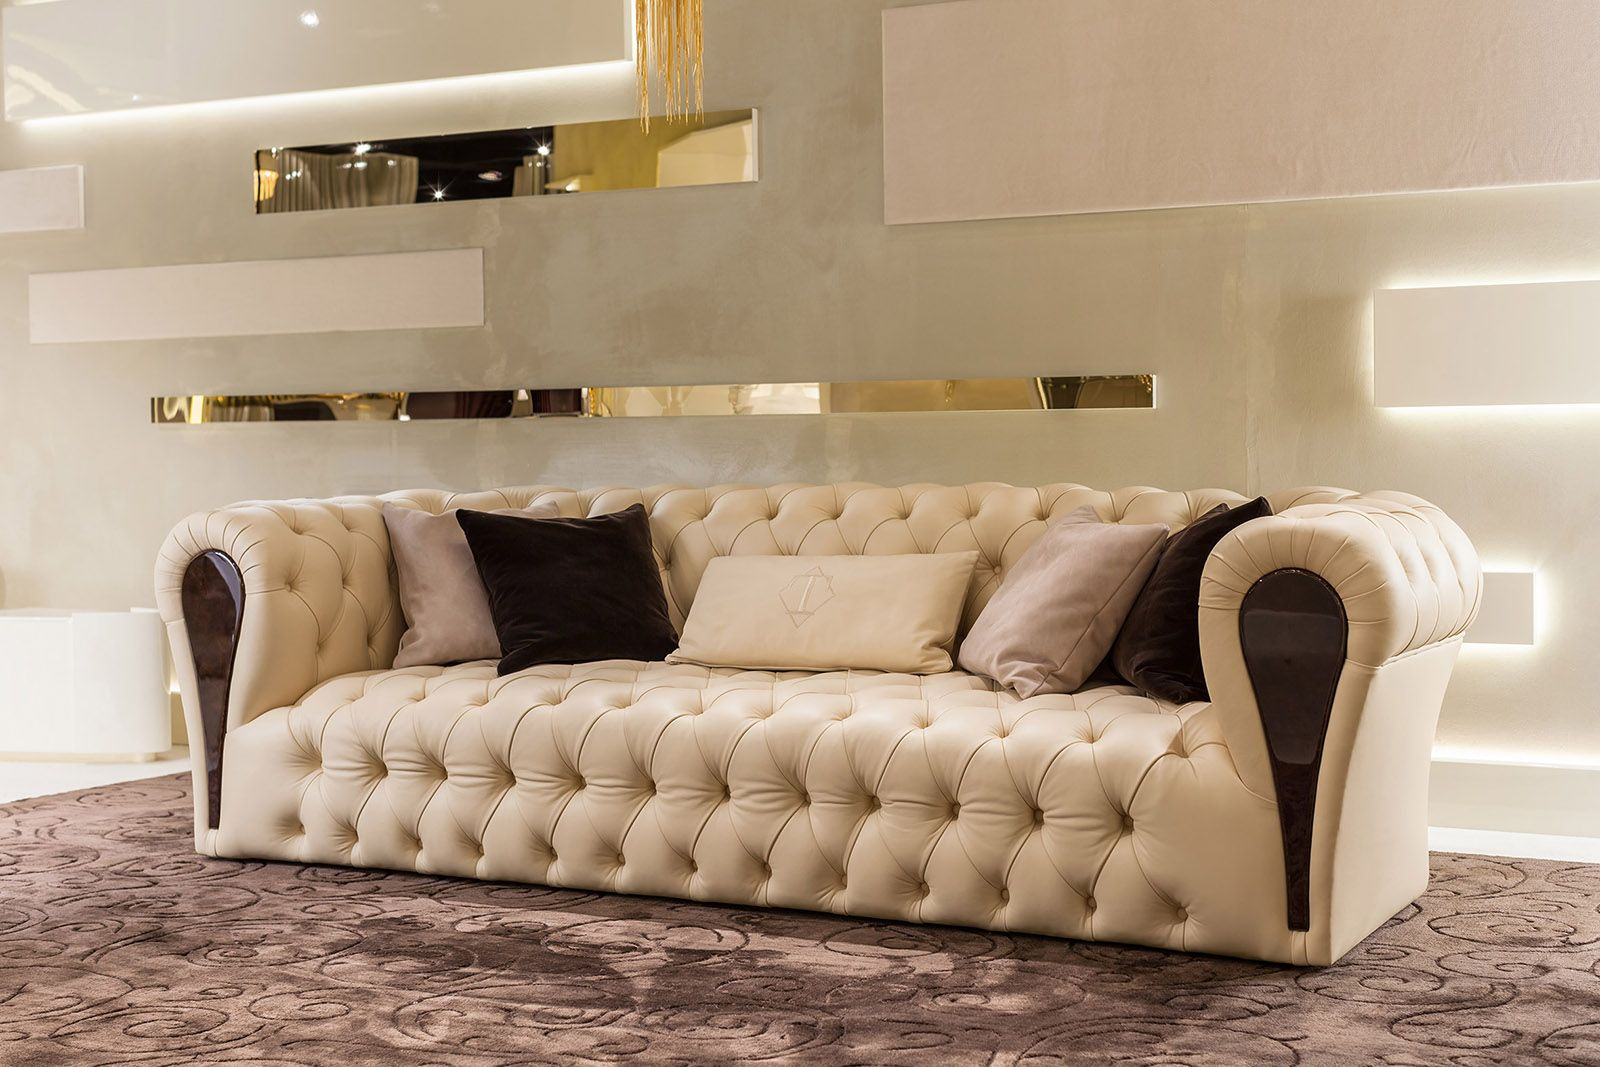 Luxary Sofa Turri Luxury Italian Furniture For Exclusive